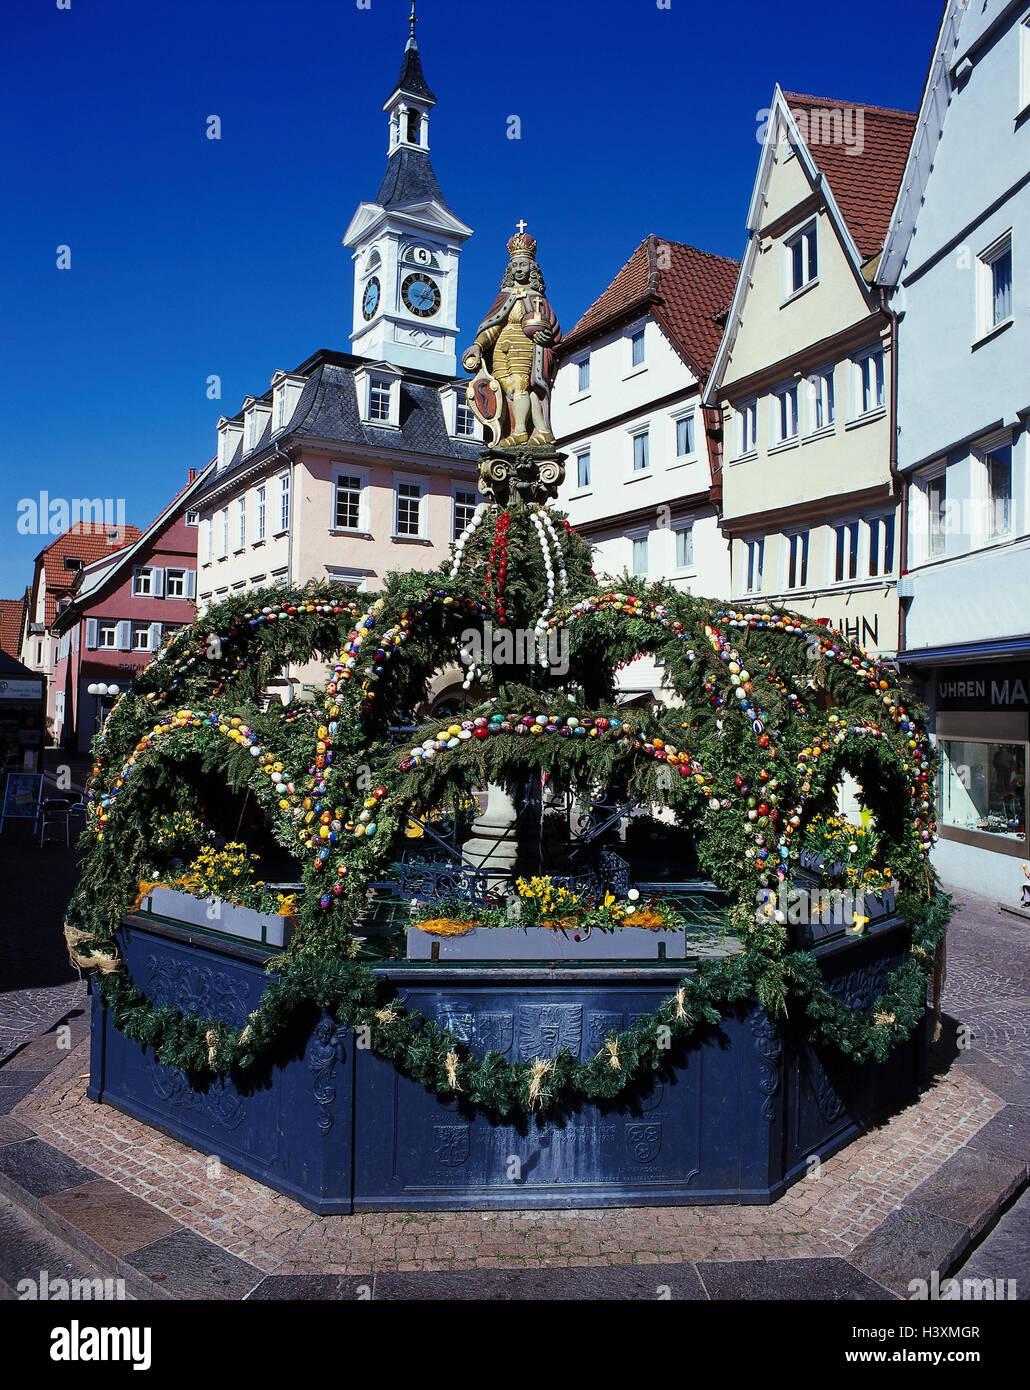 Germany, Baden-Wurttemberg, to eels, Easter wells, Europe